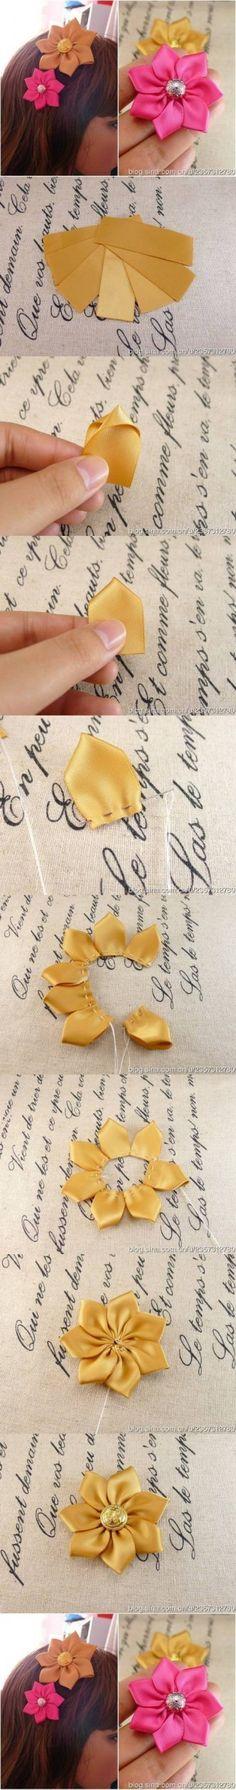 DIY Handmade Ribbon Flowers DIY Projects